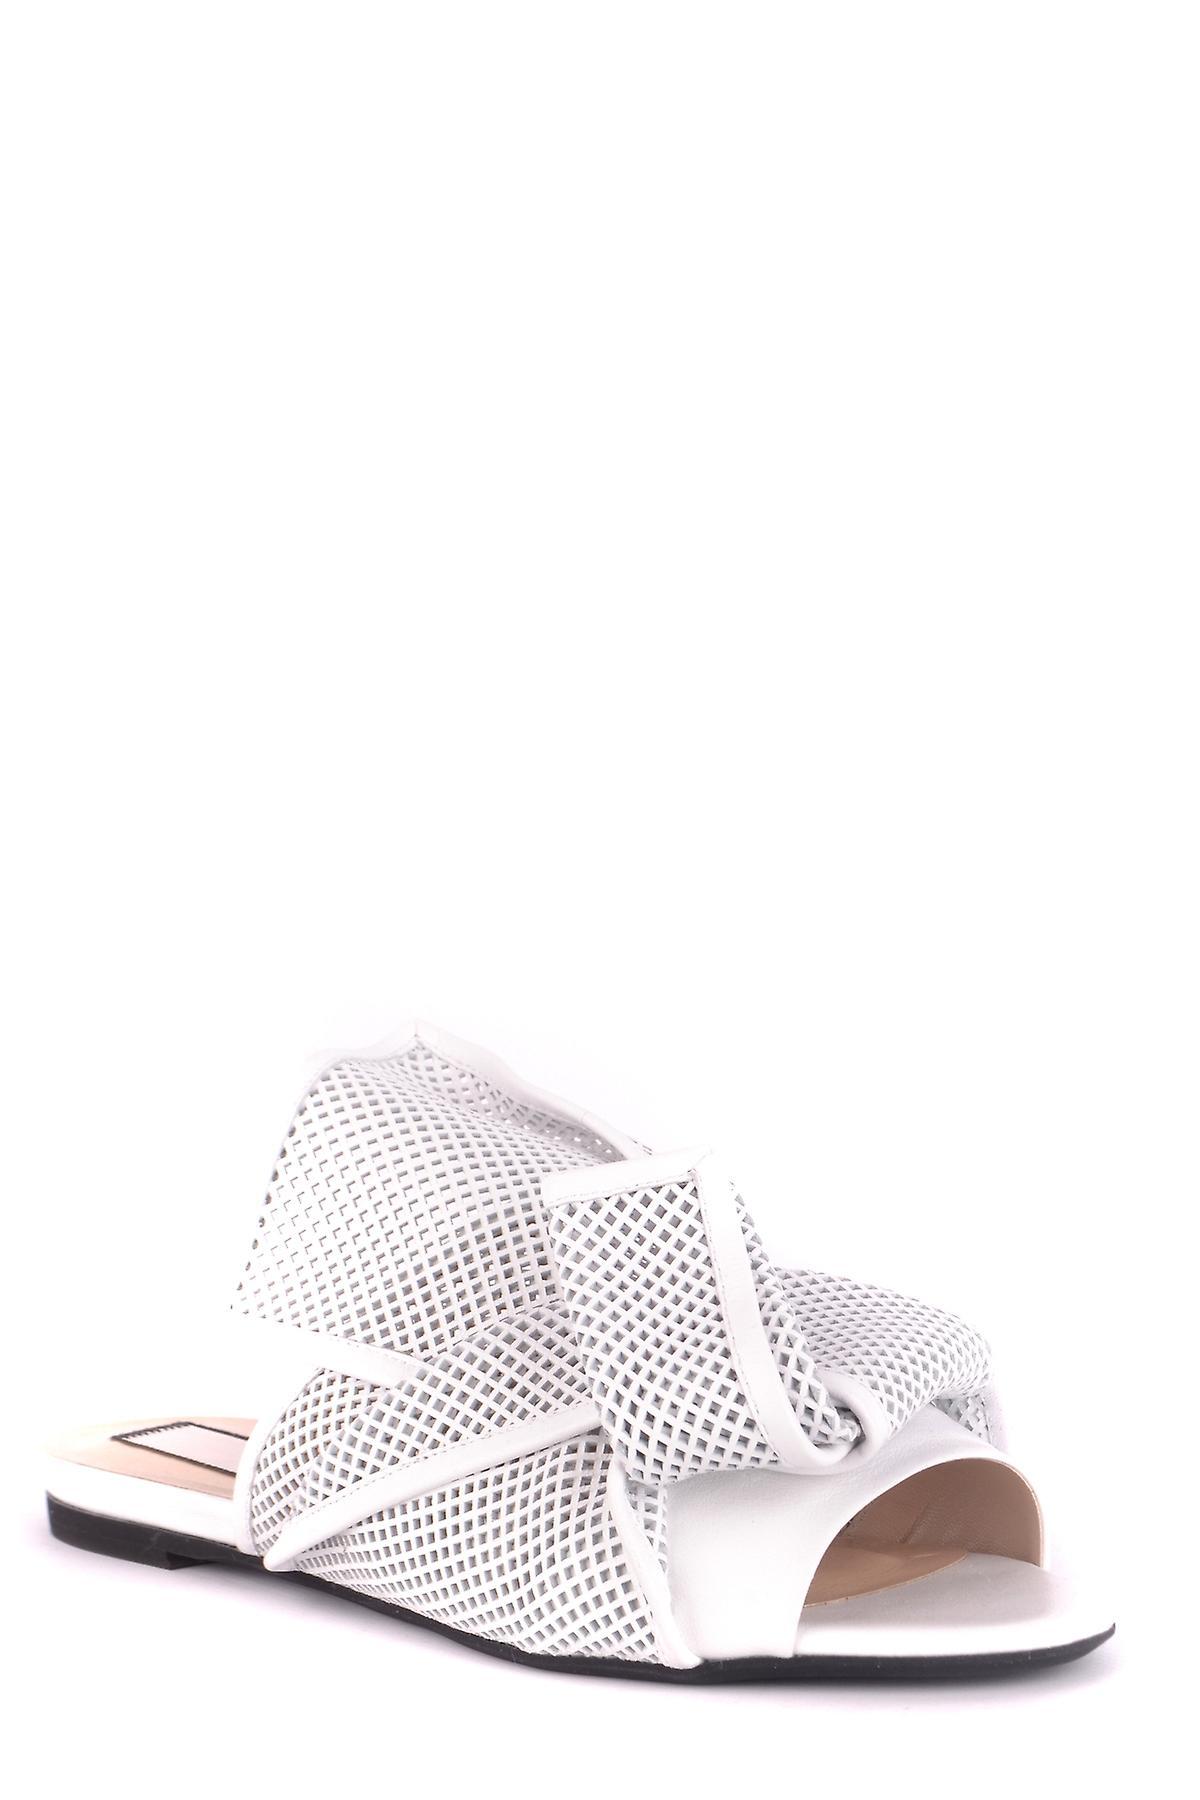 N 21 Ezbc100004 Femmes-apos;s White Leather Slippers 22P5nY